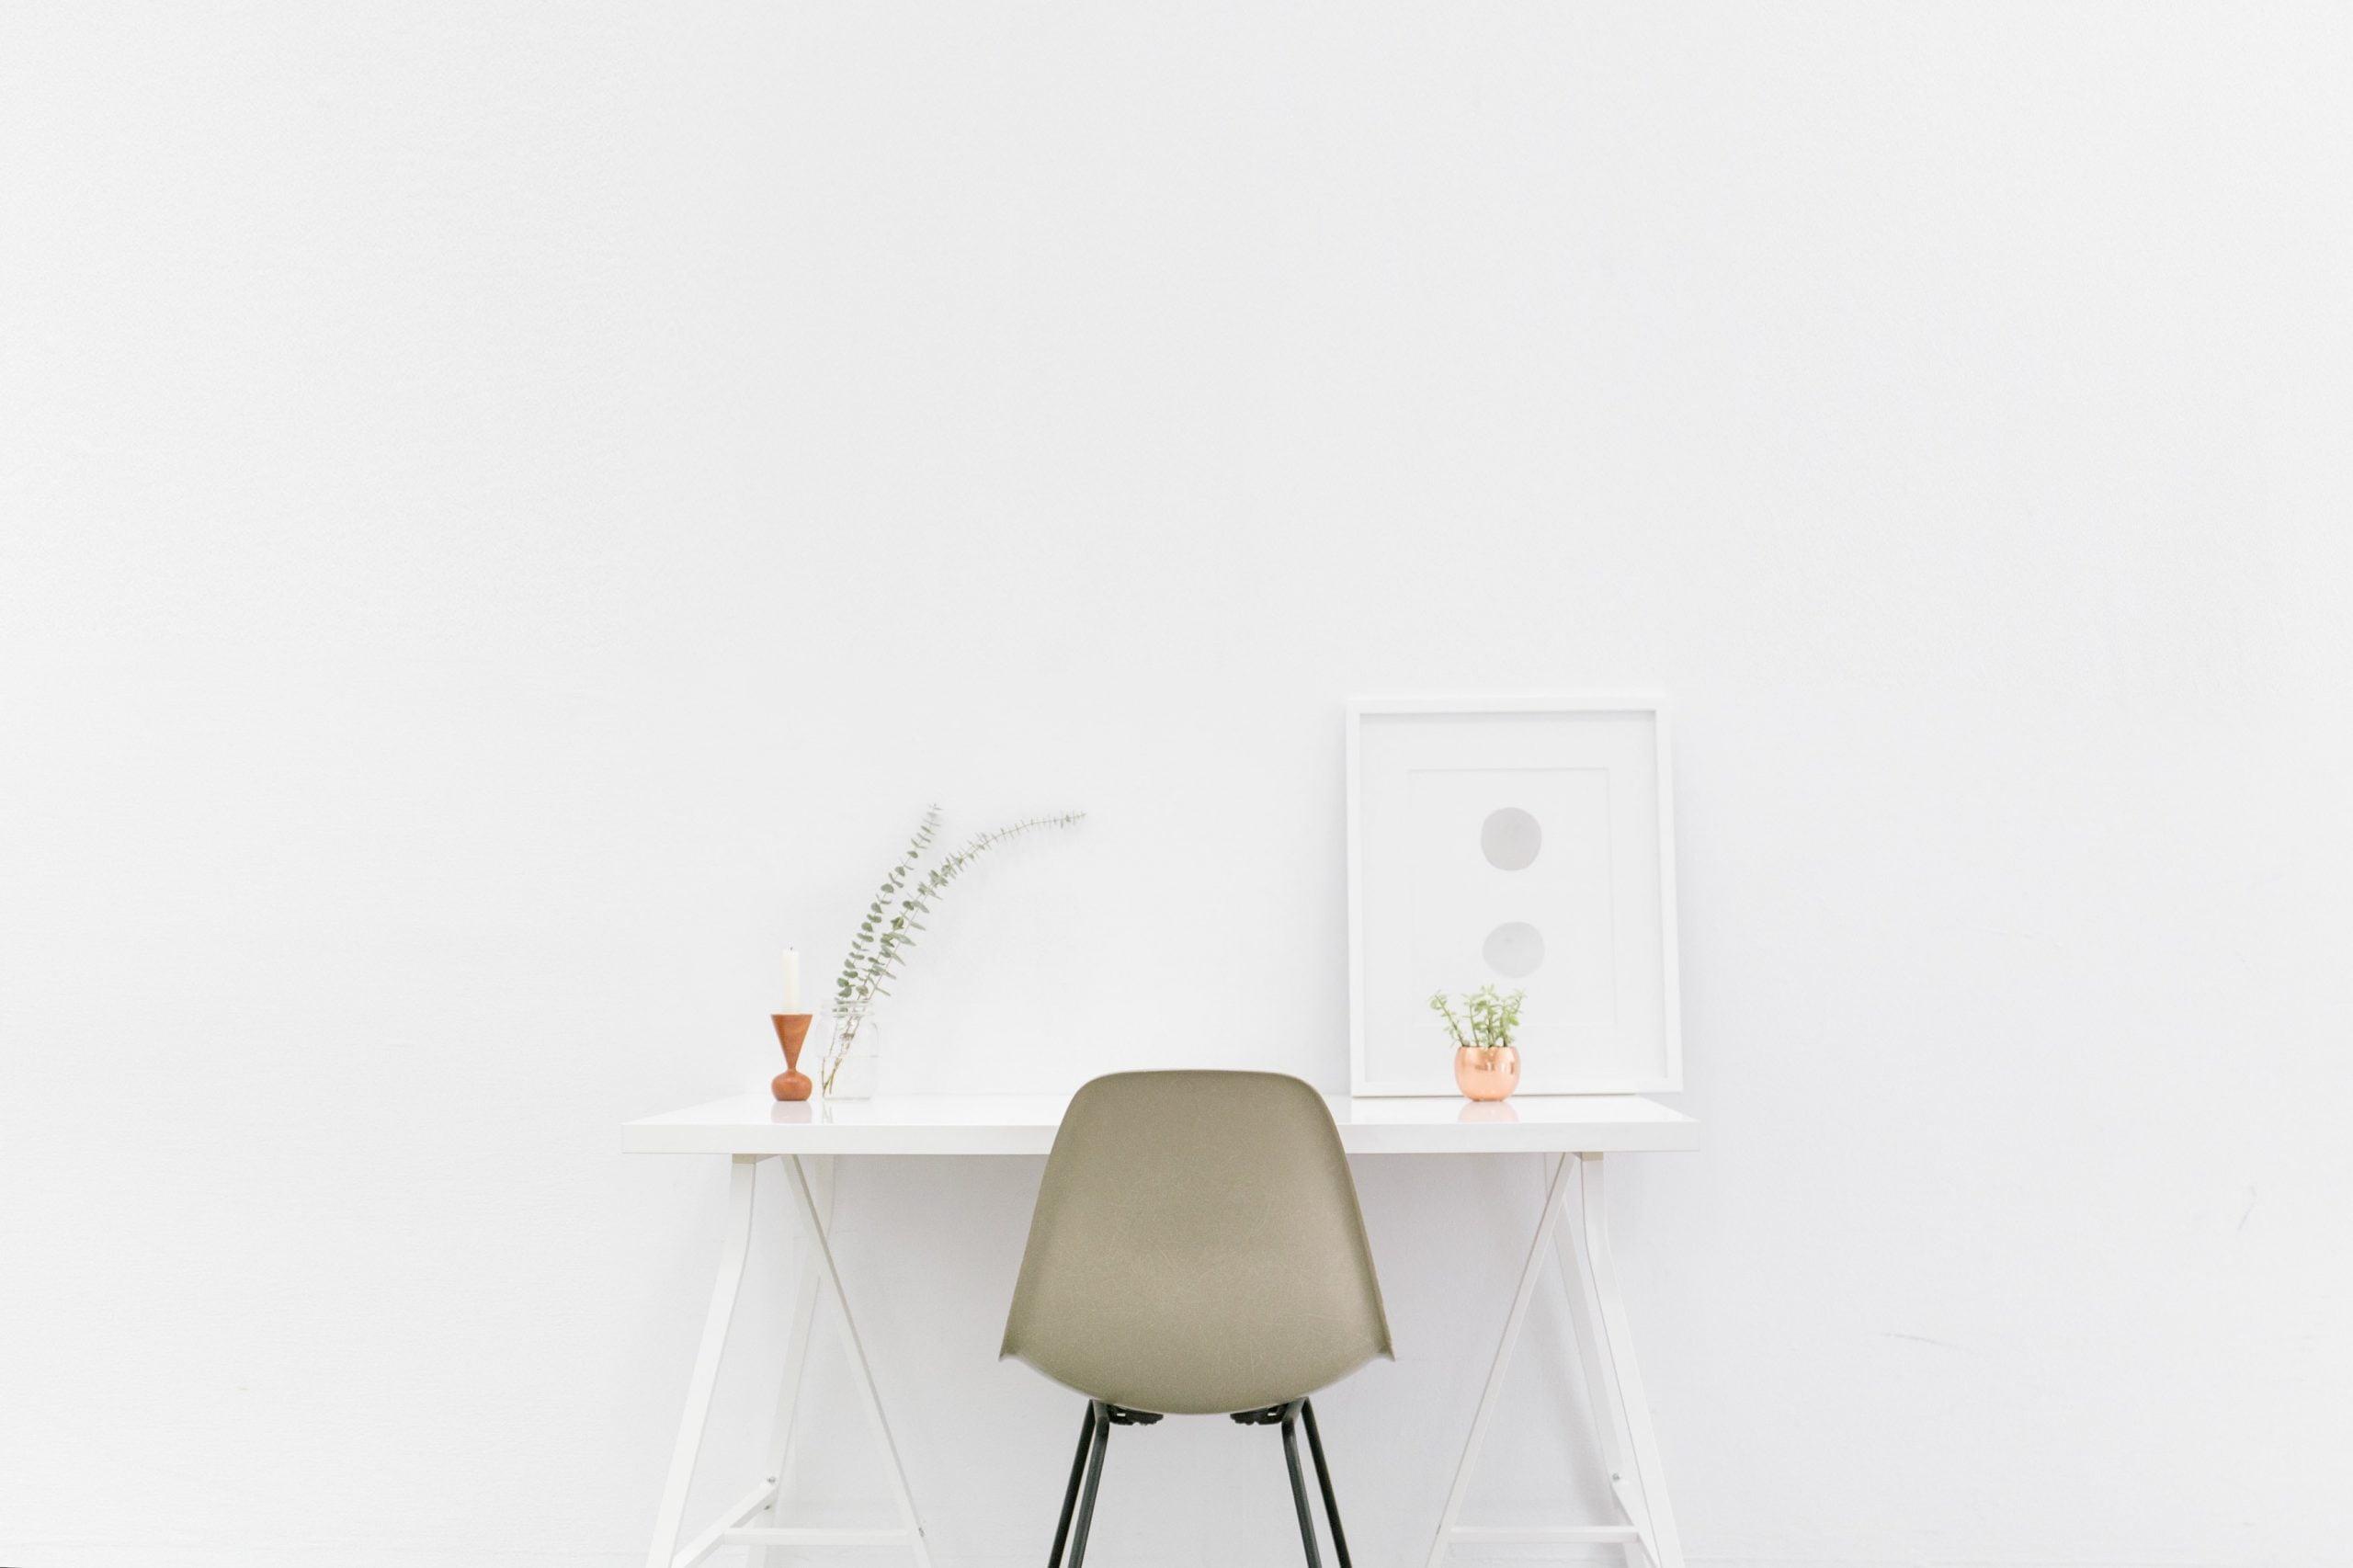 pexels pixabay 509922 min scaled 1 - 個室がなくてもOK!快適な在宅ワーク空間を作る方法|おしゃれデスクもご紹介